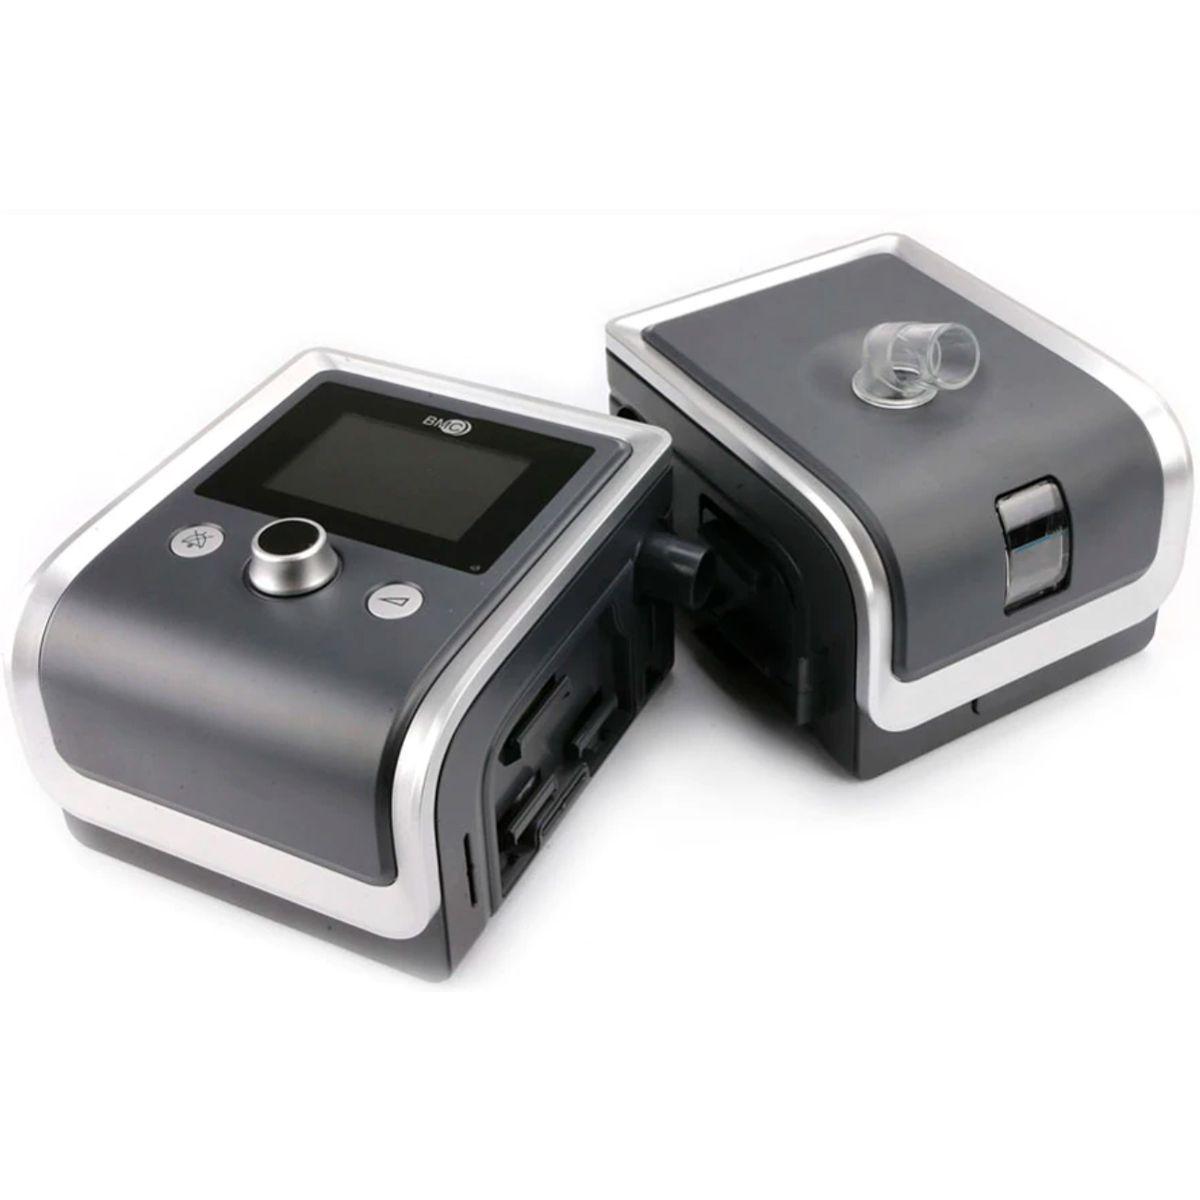 CPAP Automático RESmart G2 + Umidificador + Máscara Pico Philips Respironics